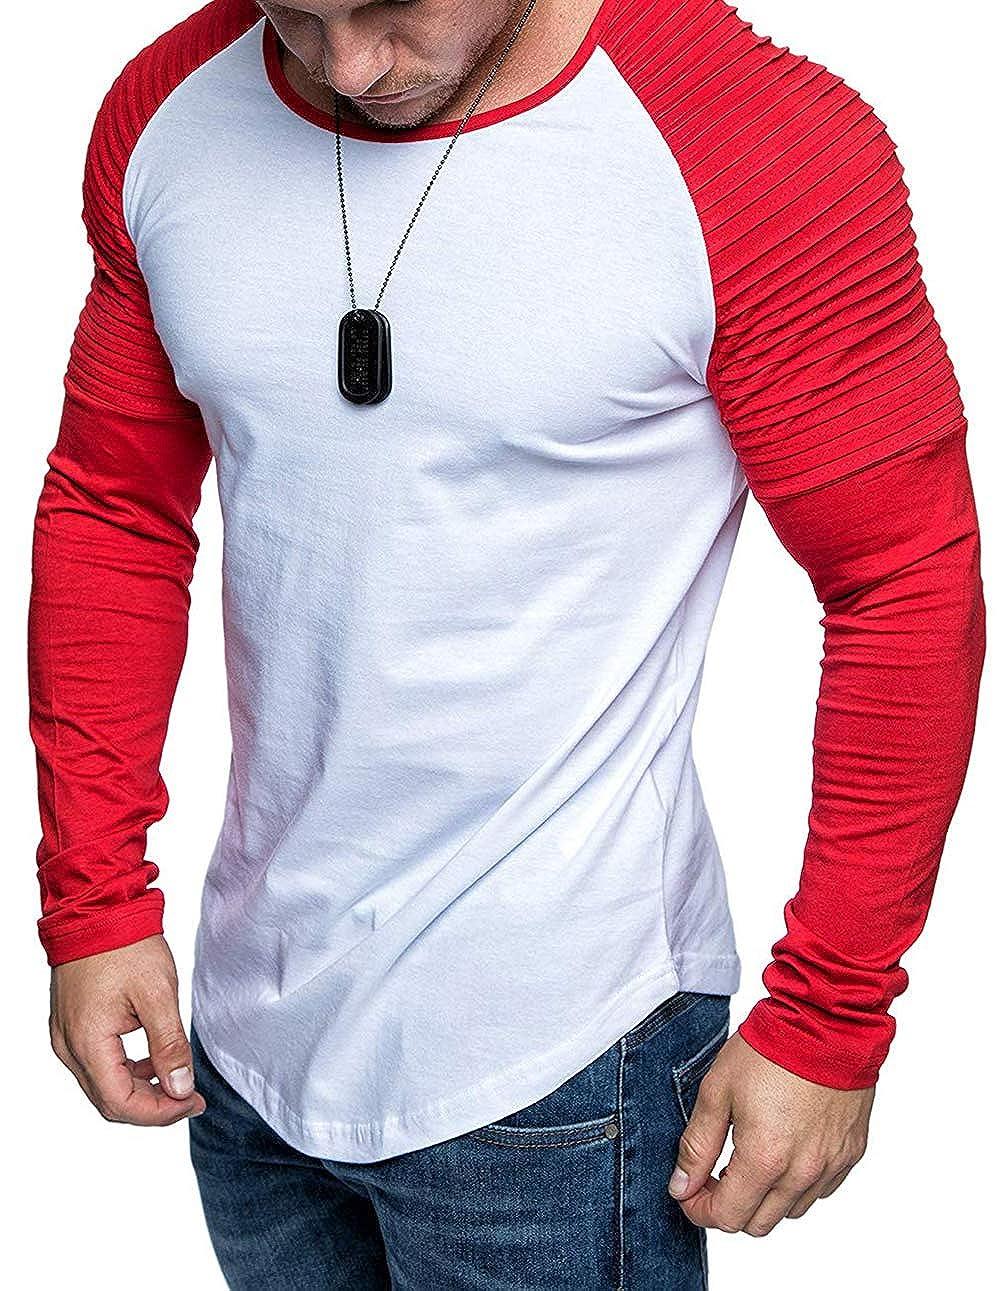 Amazon.com: XARAZA - Blusa de manga larga para hombre ...